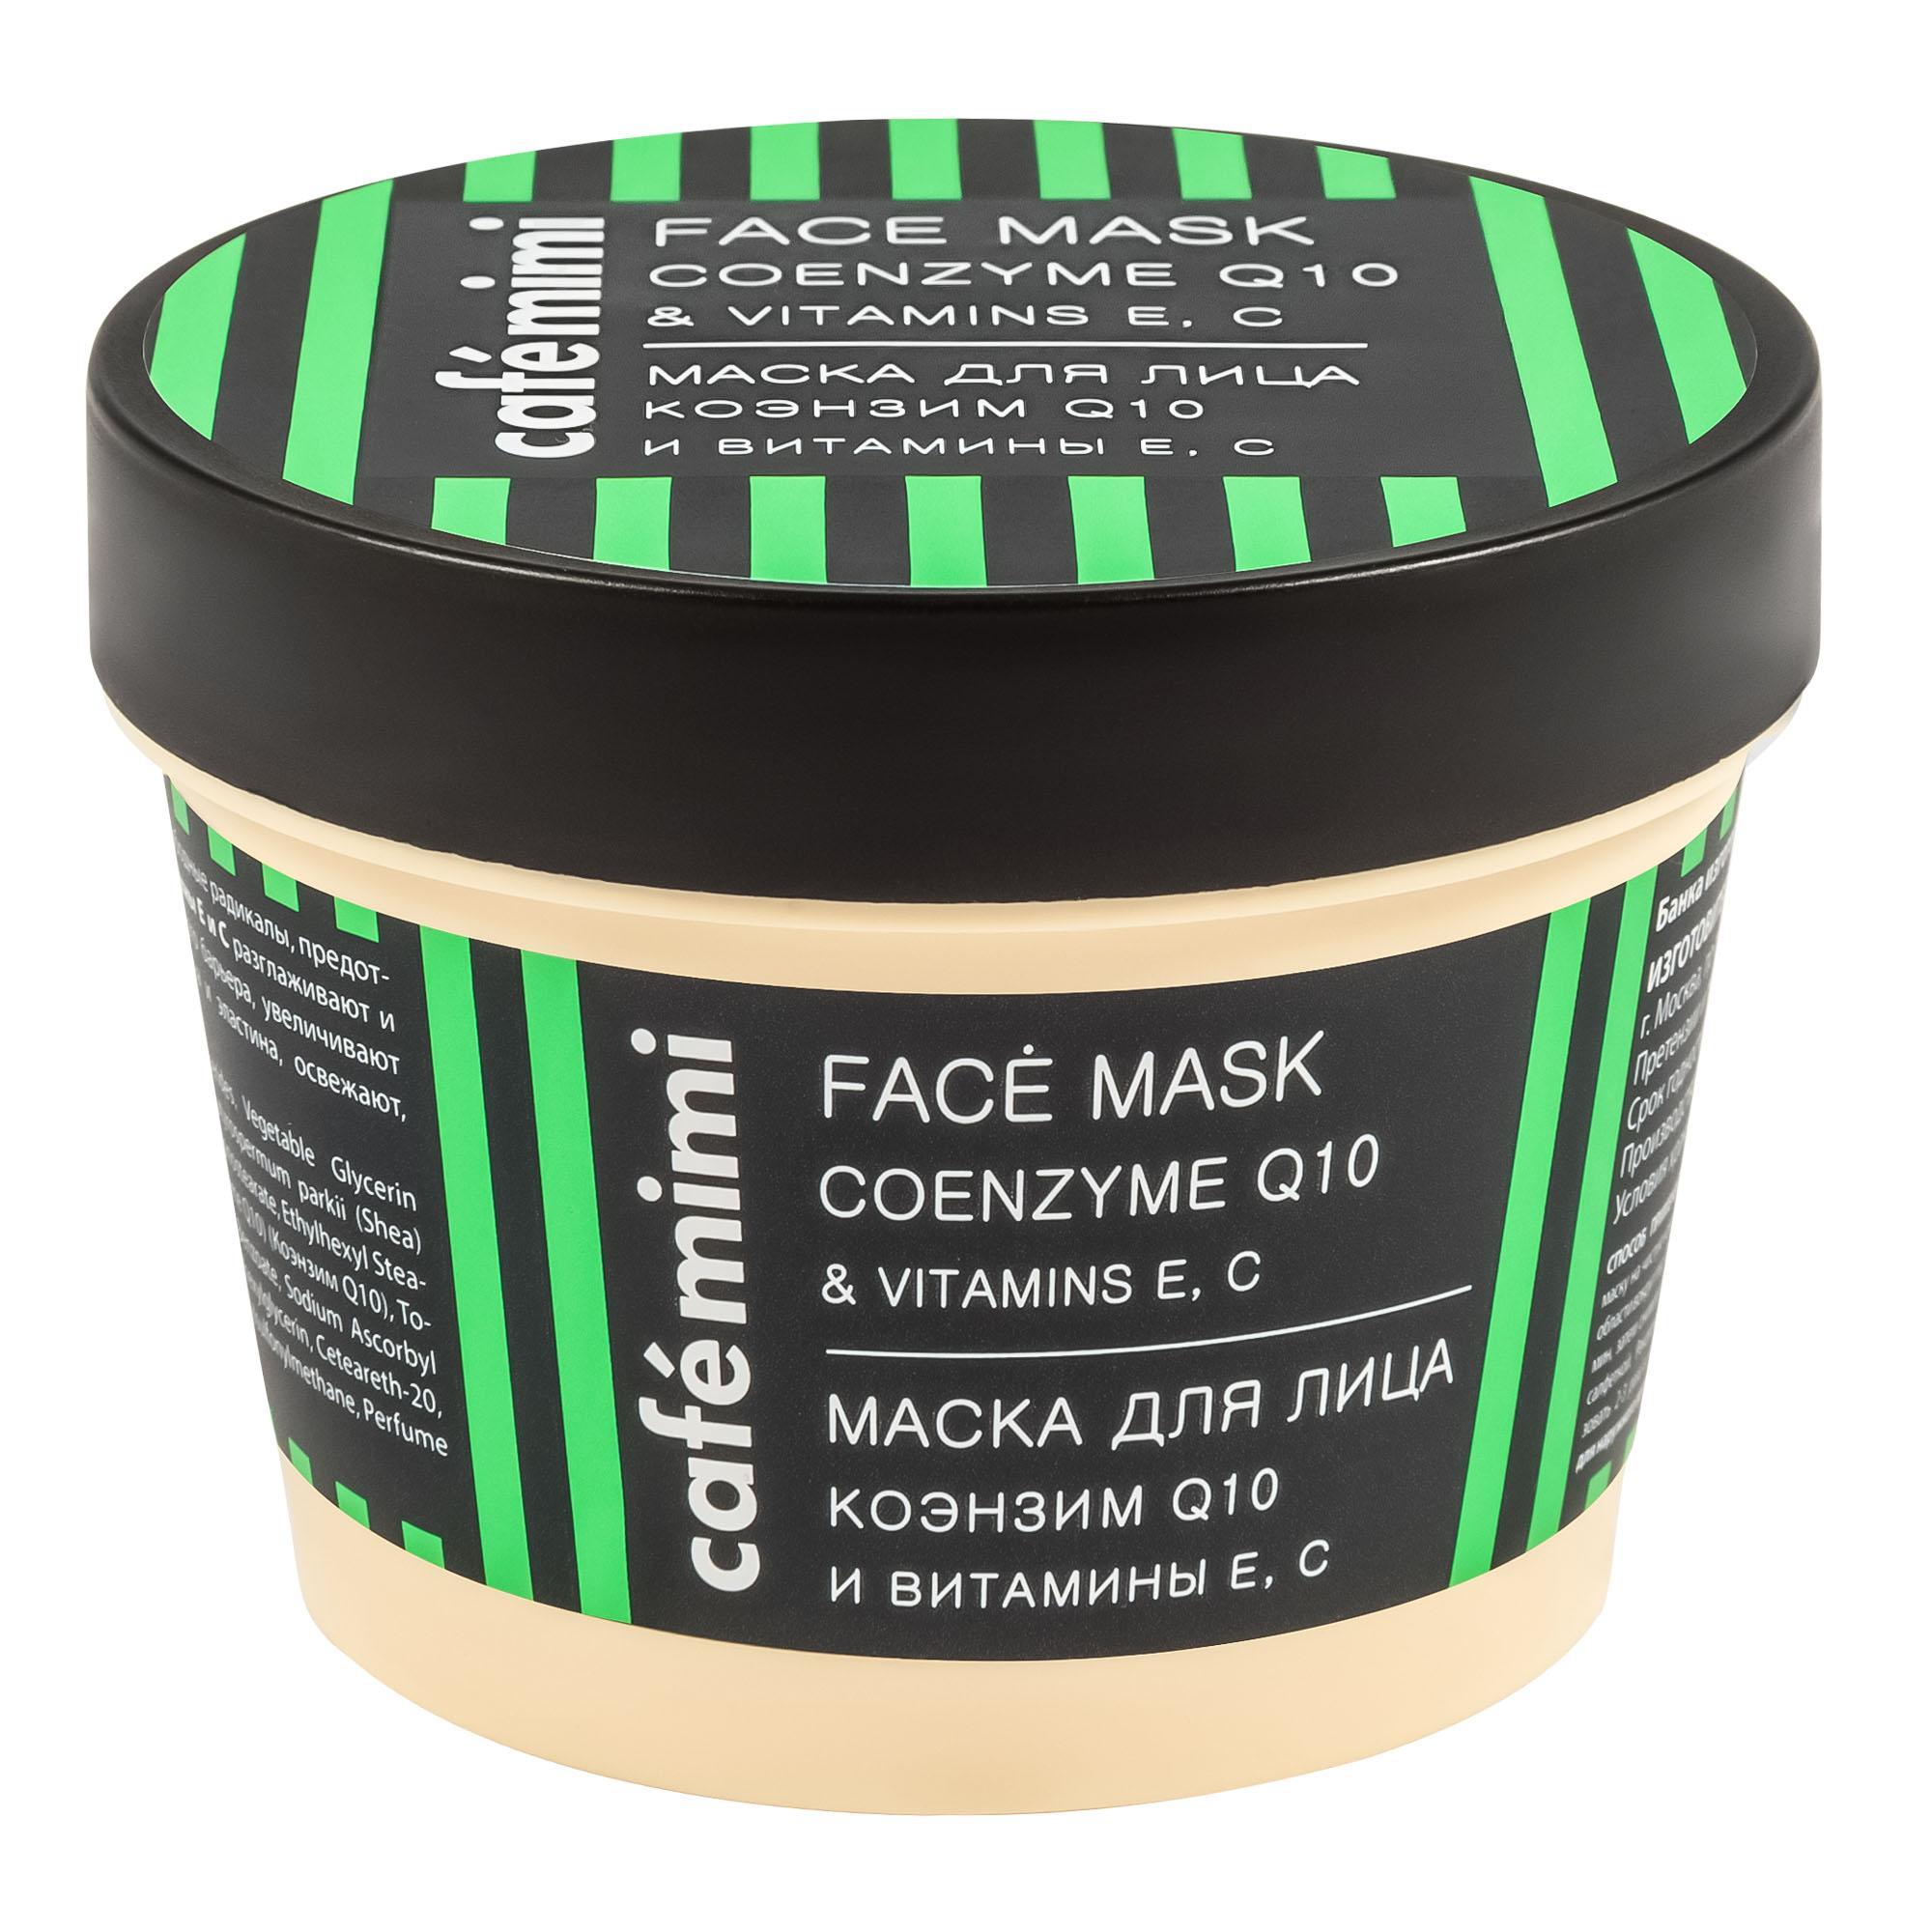 Café Mimi Mascarilla Facial Coenzima Q10 y Vitamina E y C